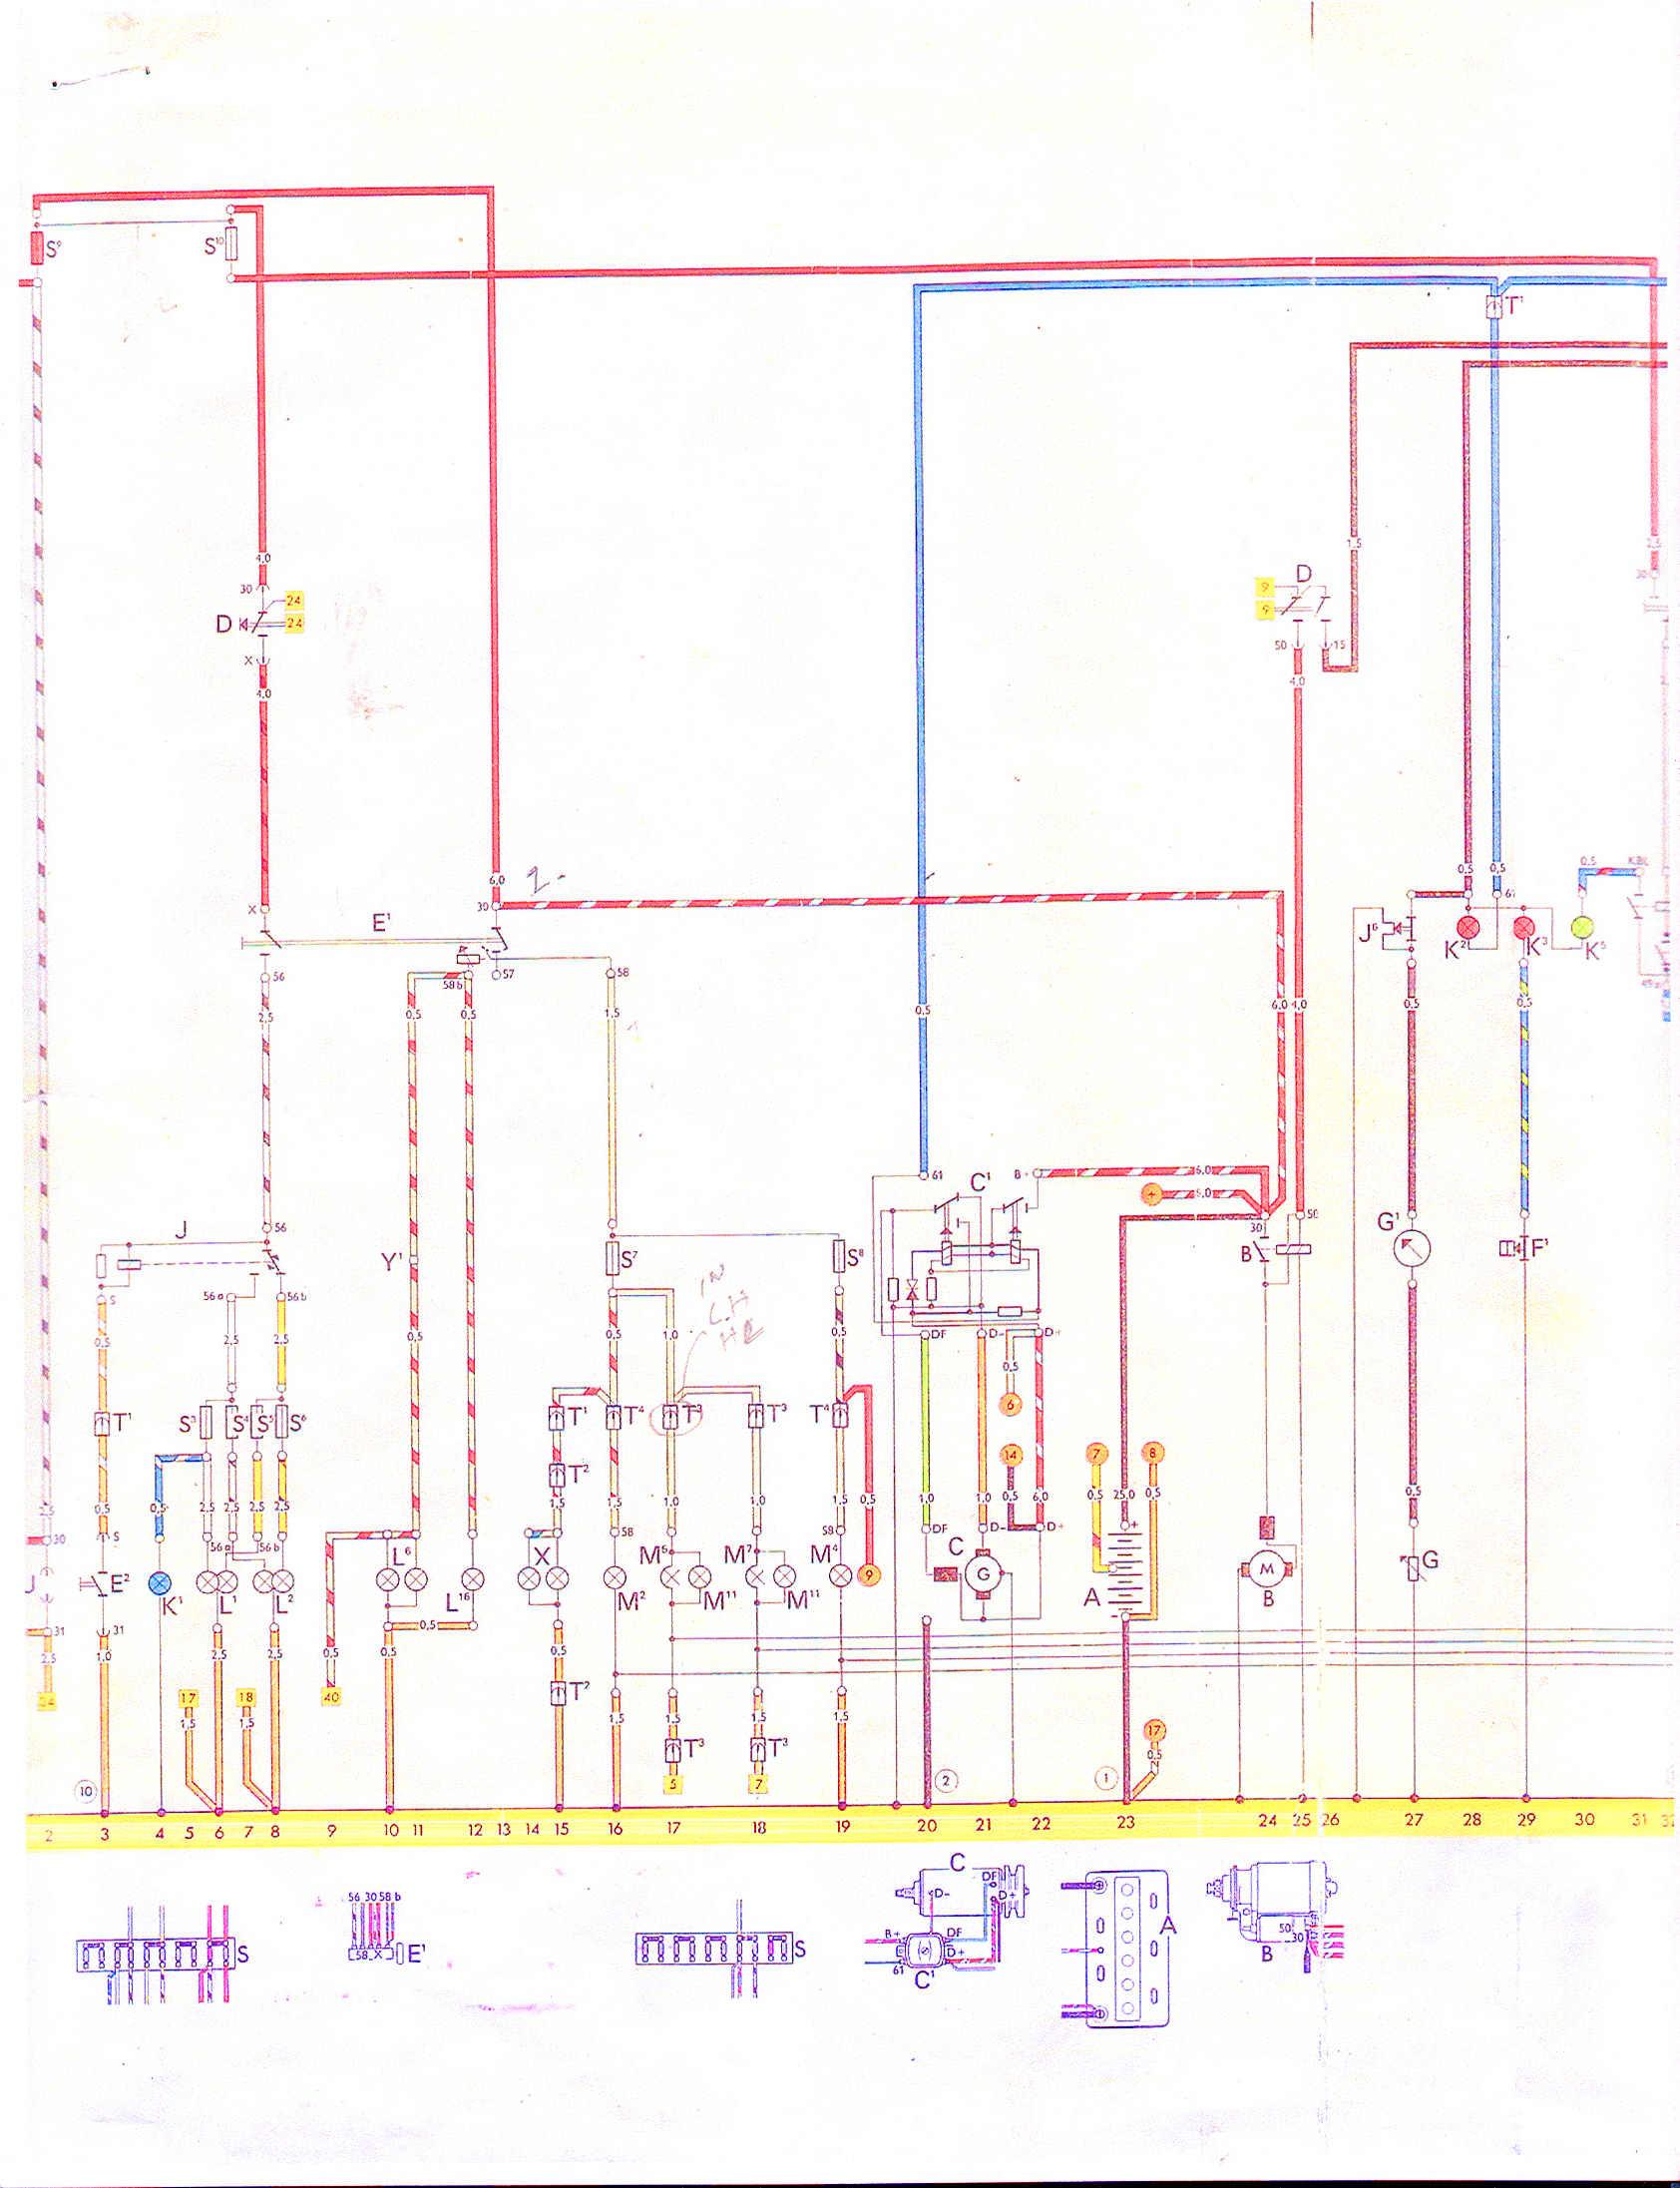 hight resolution of wiring vw thing type 181 restoration vw engine wiring diagram 1973 vw thing wiring diagram